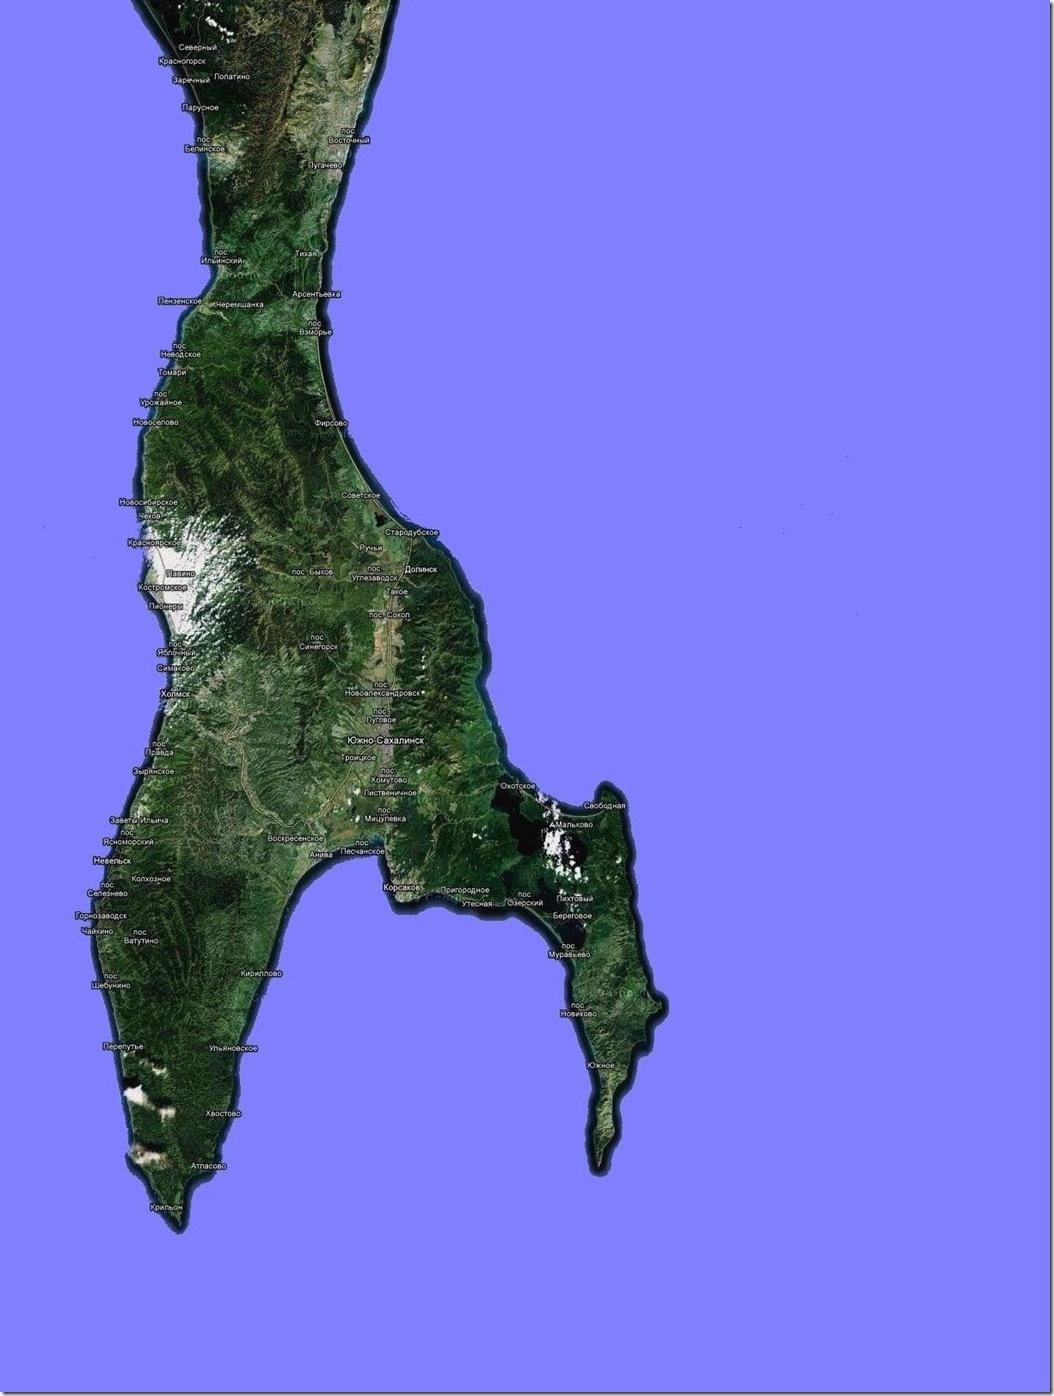 фото острова сахалина распечатать